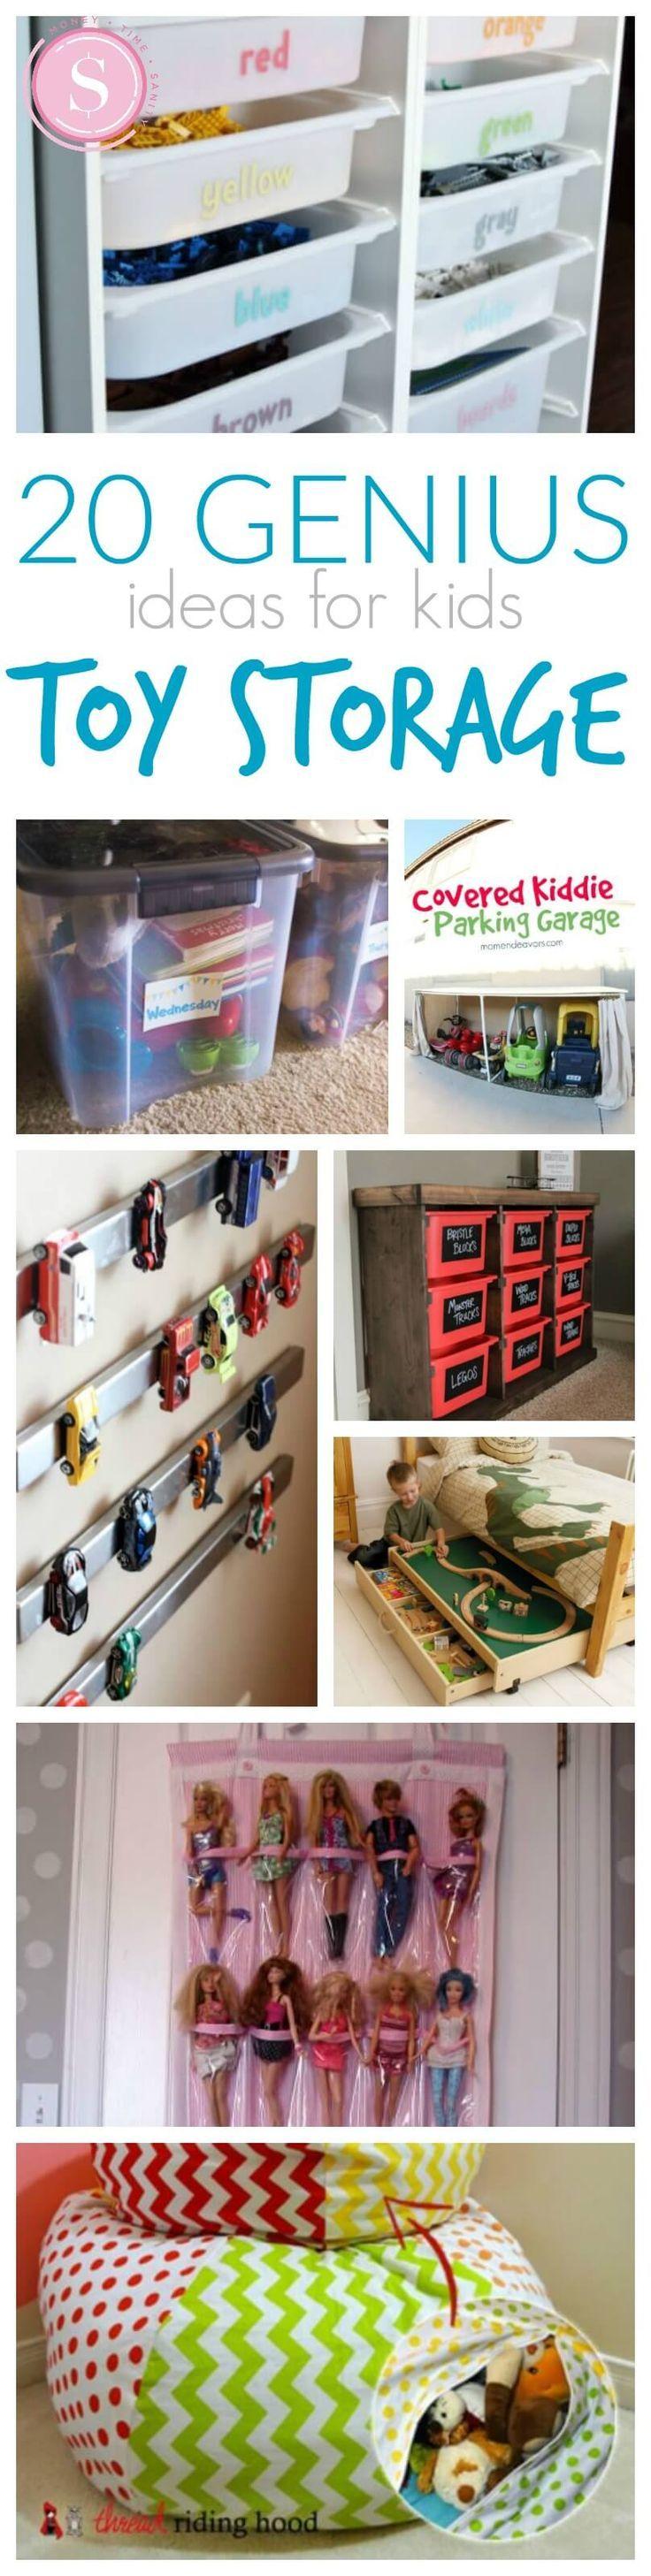 Narrow hallway storage solutions   best Shoe rack for Tonyus garage images on Pinterest  Home ideas